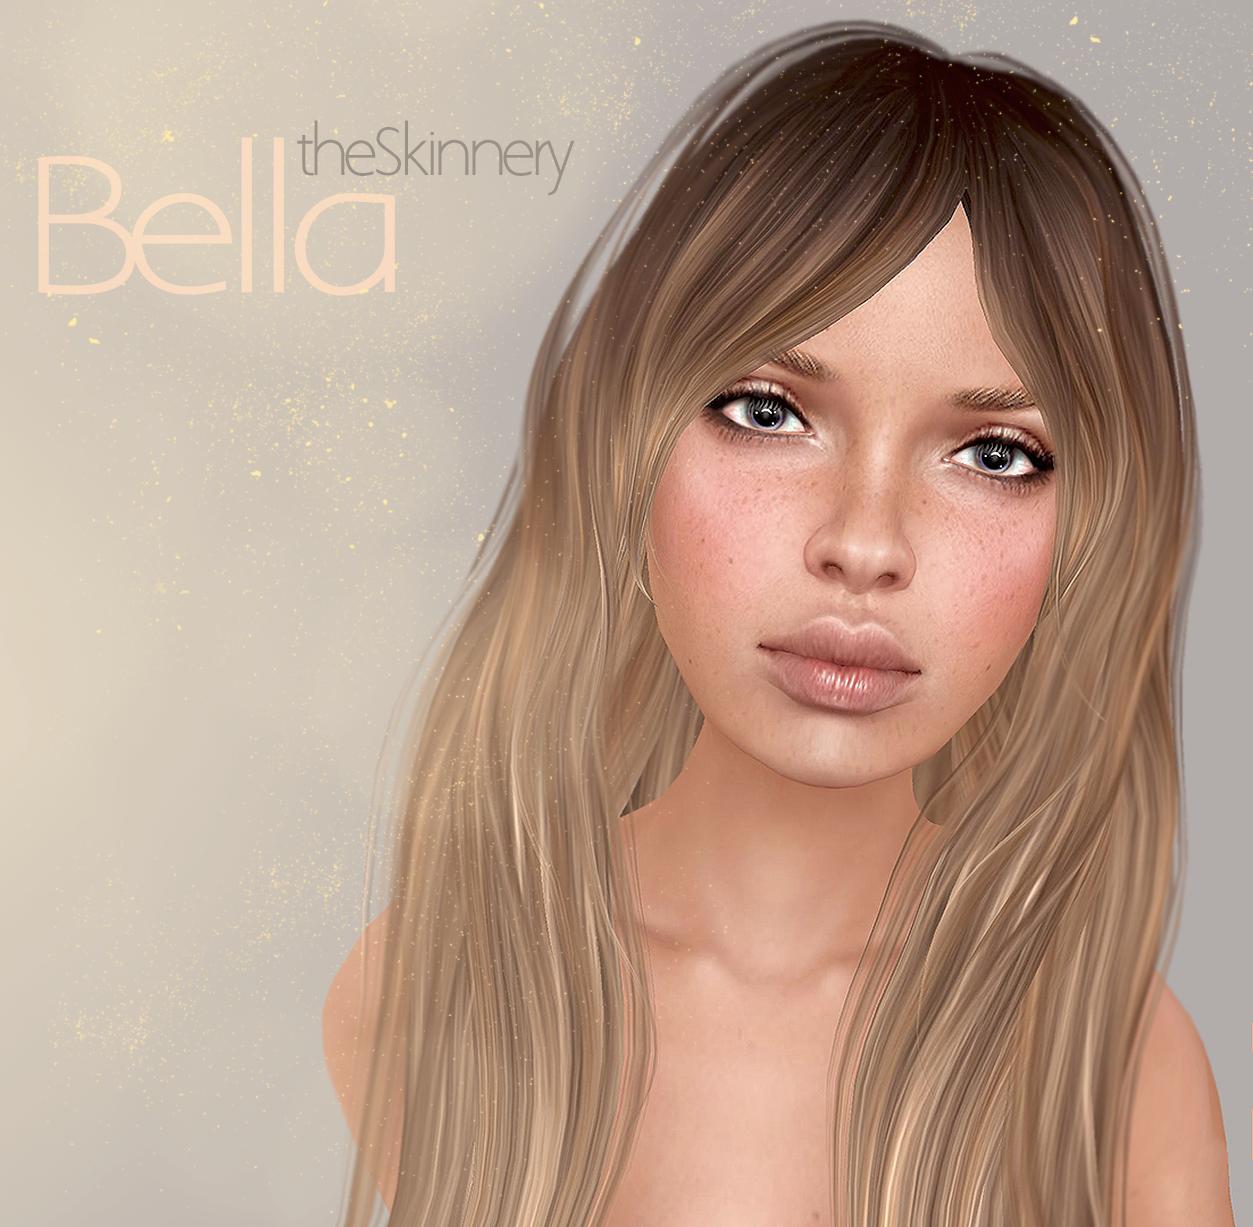 [theSkinnery]: Bella skin full release